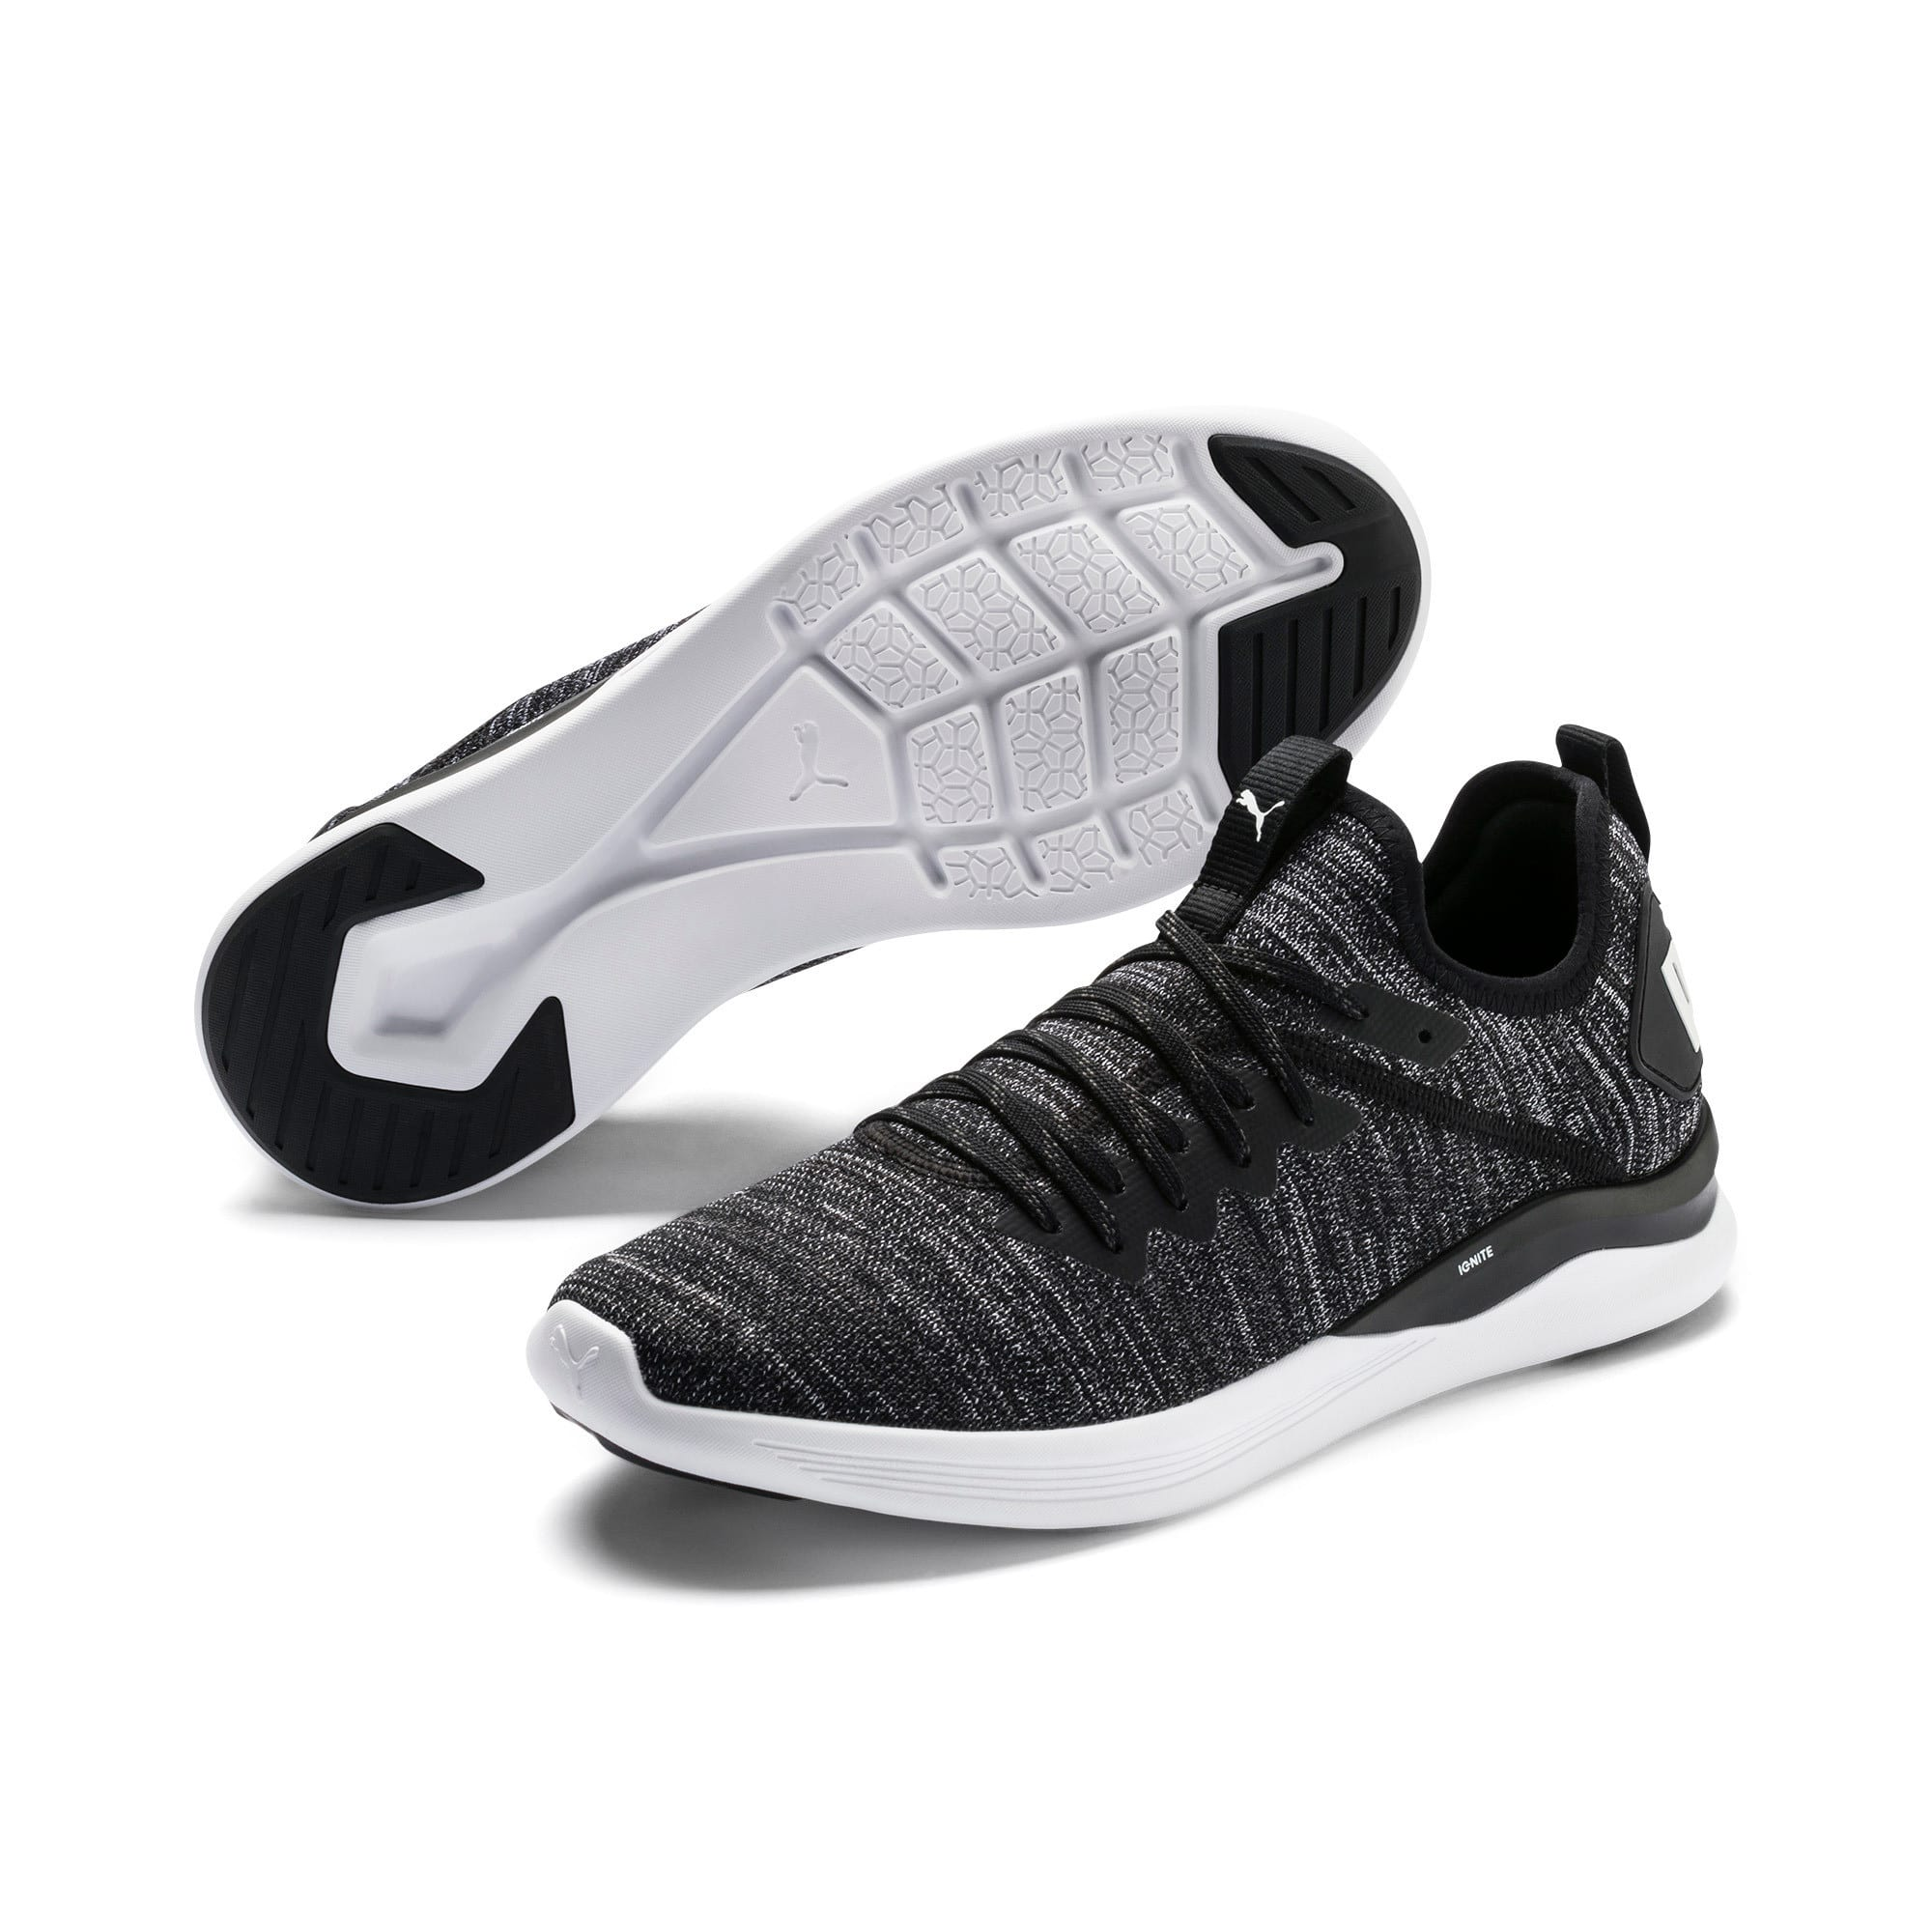 Thumbnail 2 of IGNITE Flash evoKNIT Men's Training Shoes, Forest Night-Gray-Black, medium-IND